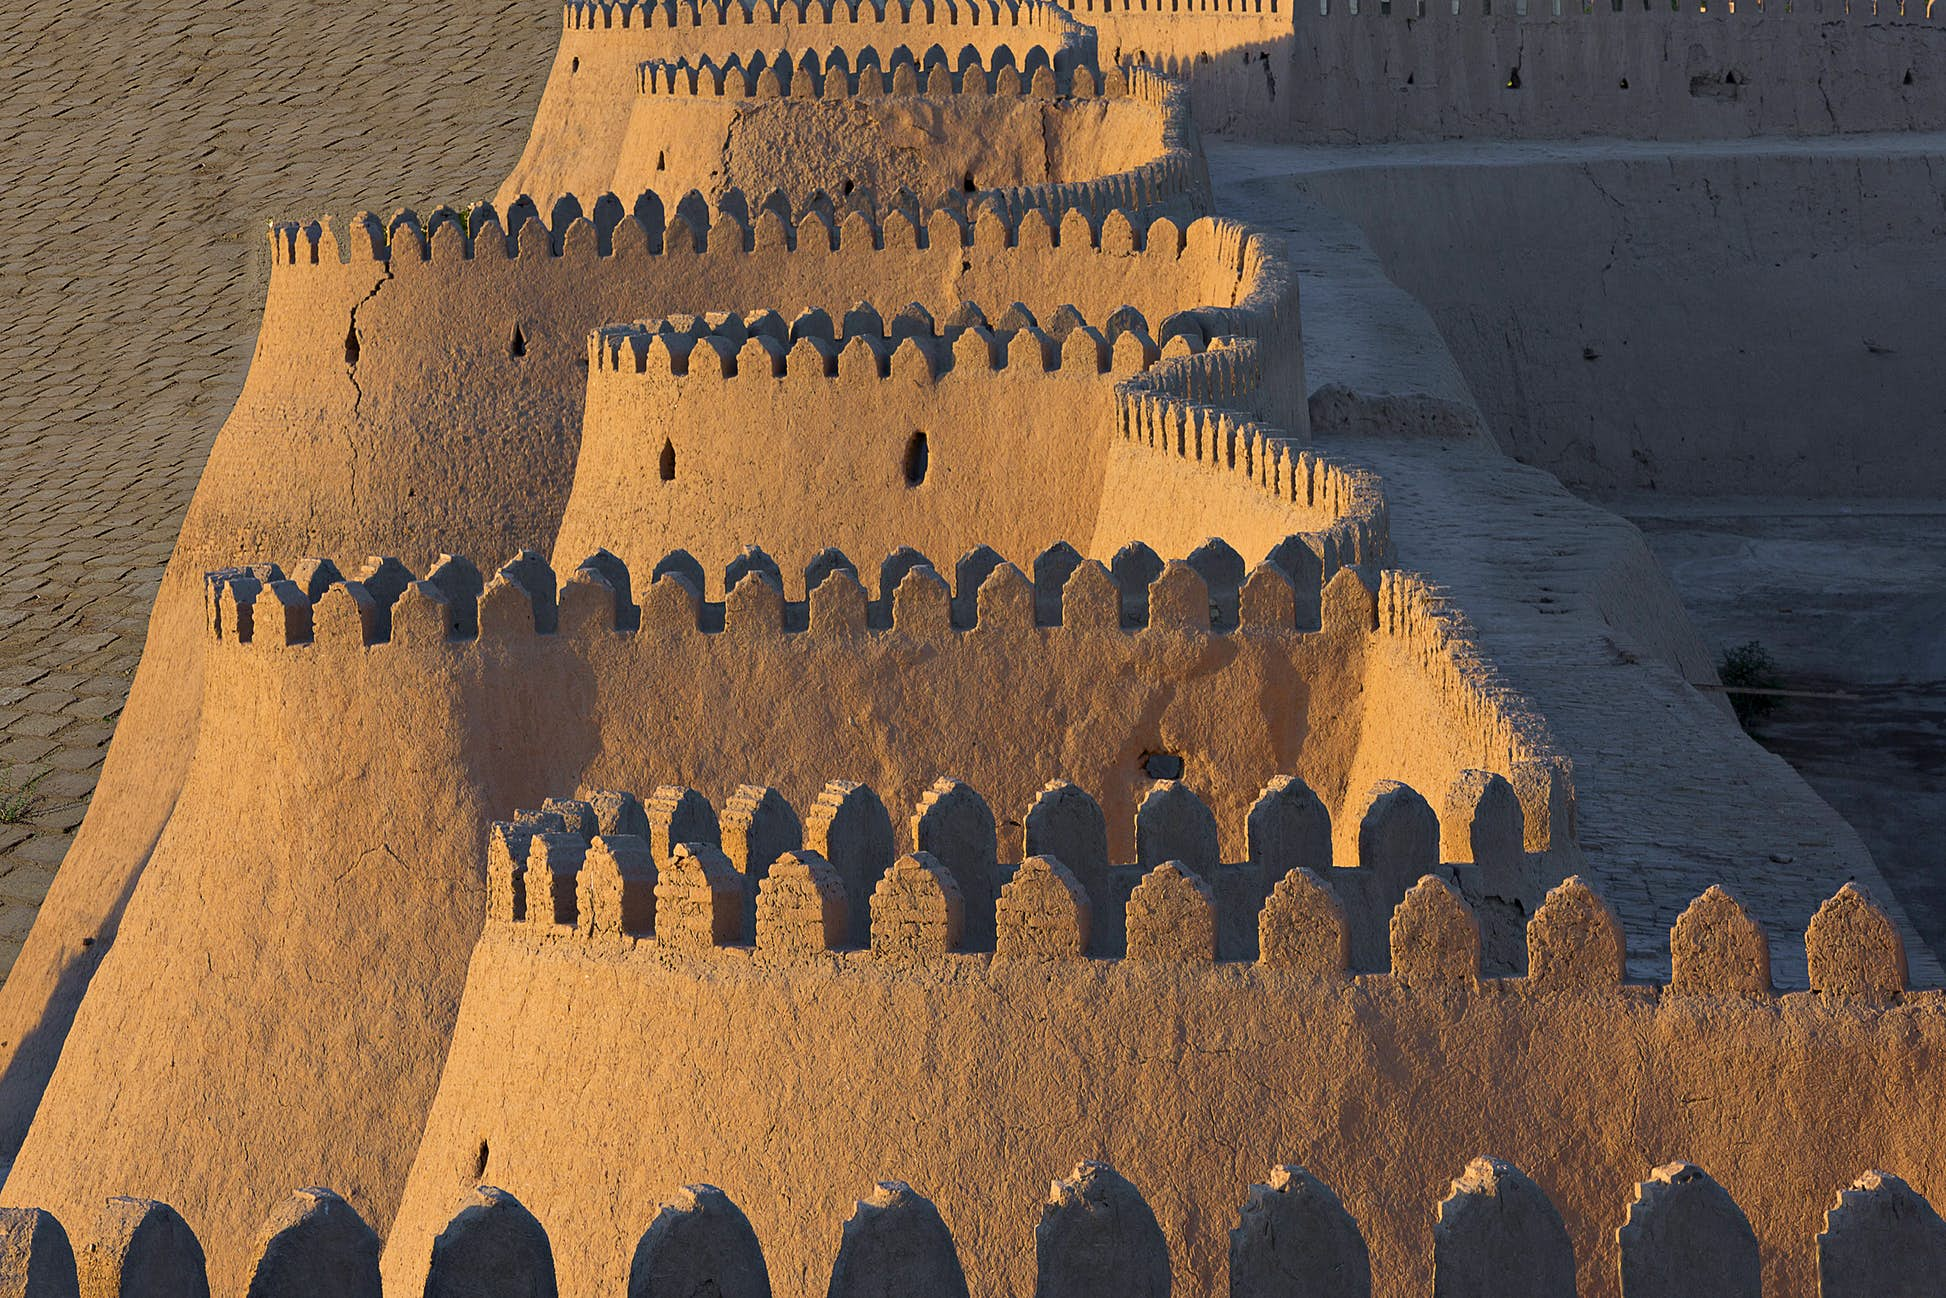 City walls of Khiva in Uzbekistan ©Ozbalci/Getty Images